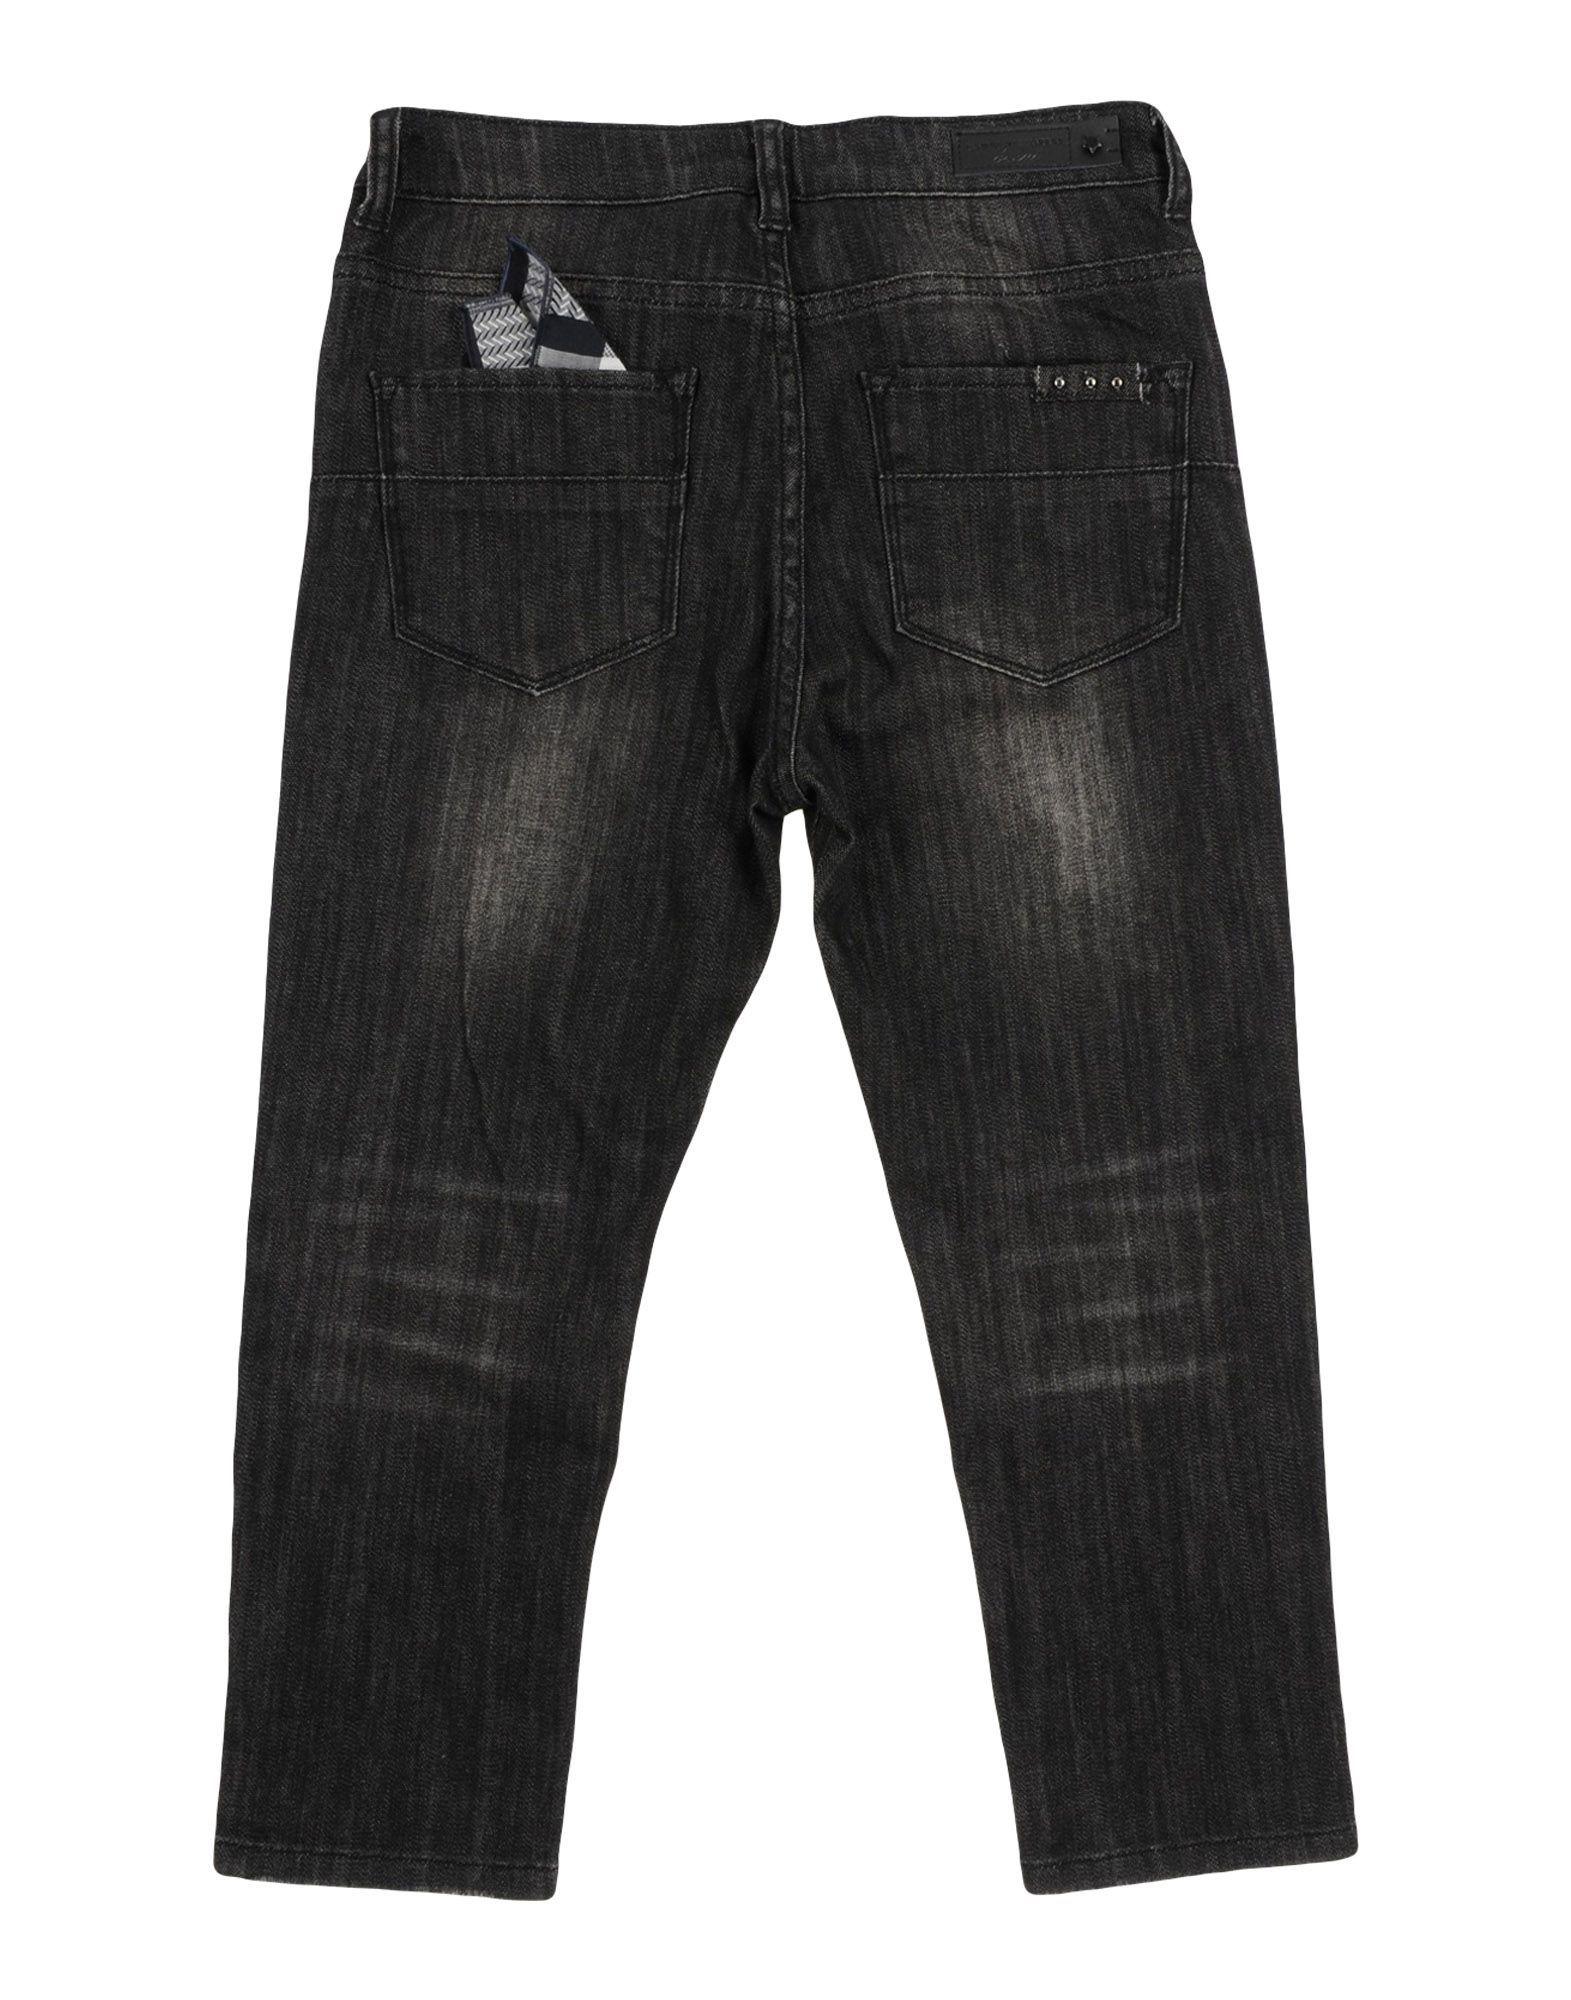 Daniele Alessandrini Boy Denim trousers Black Cotton